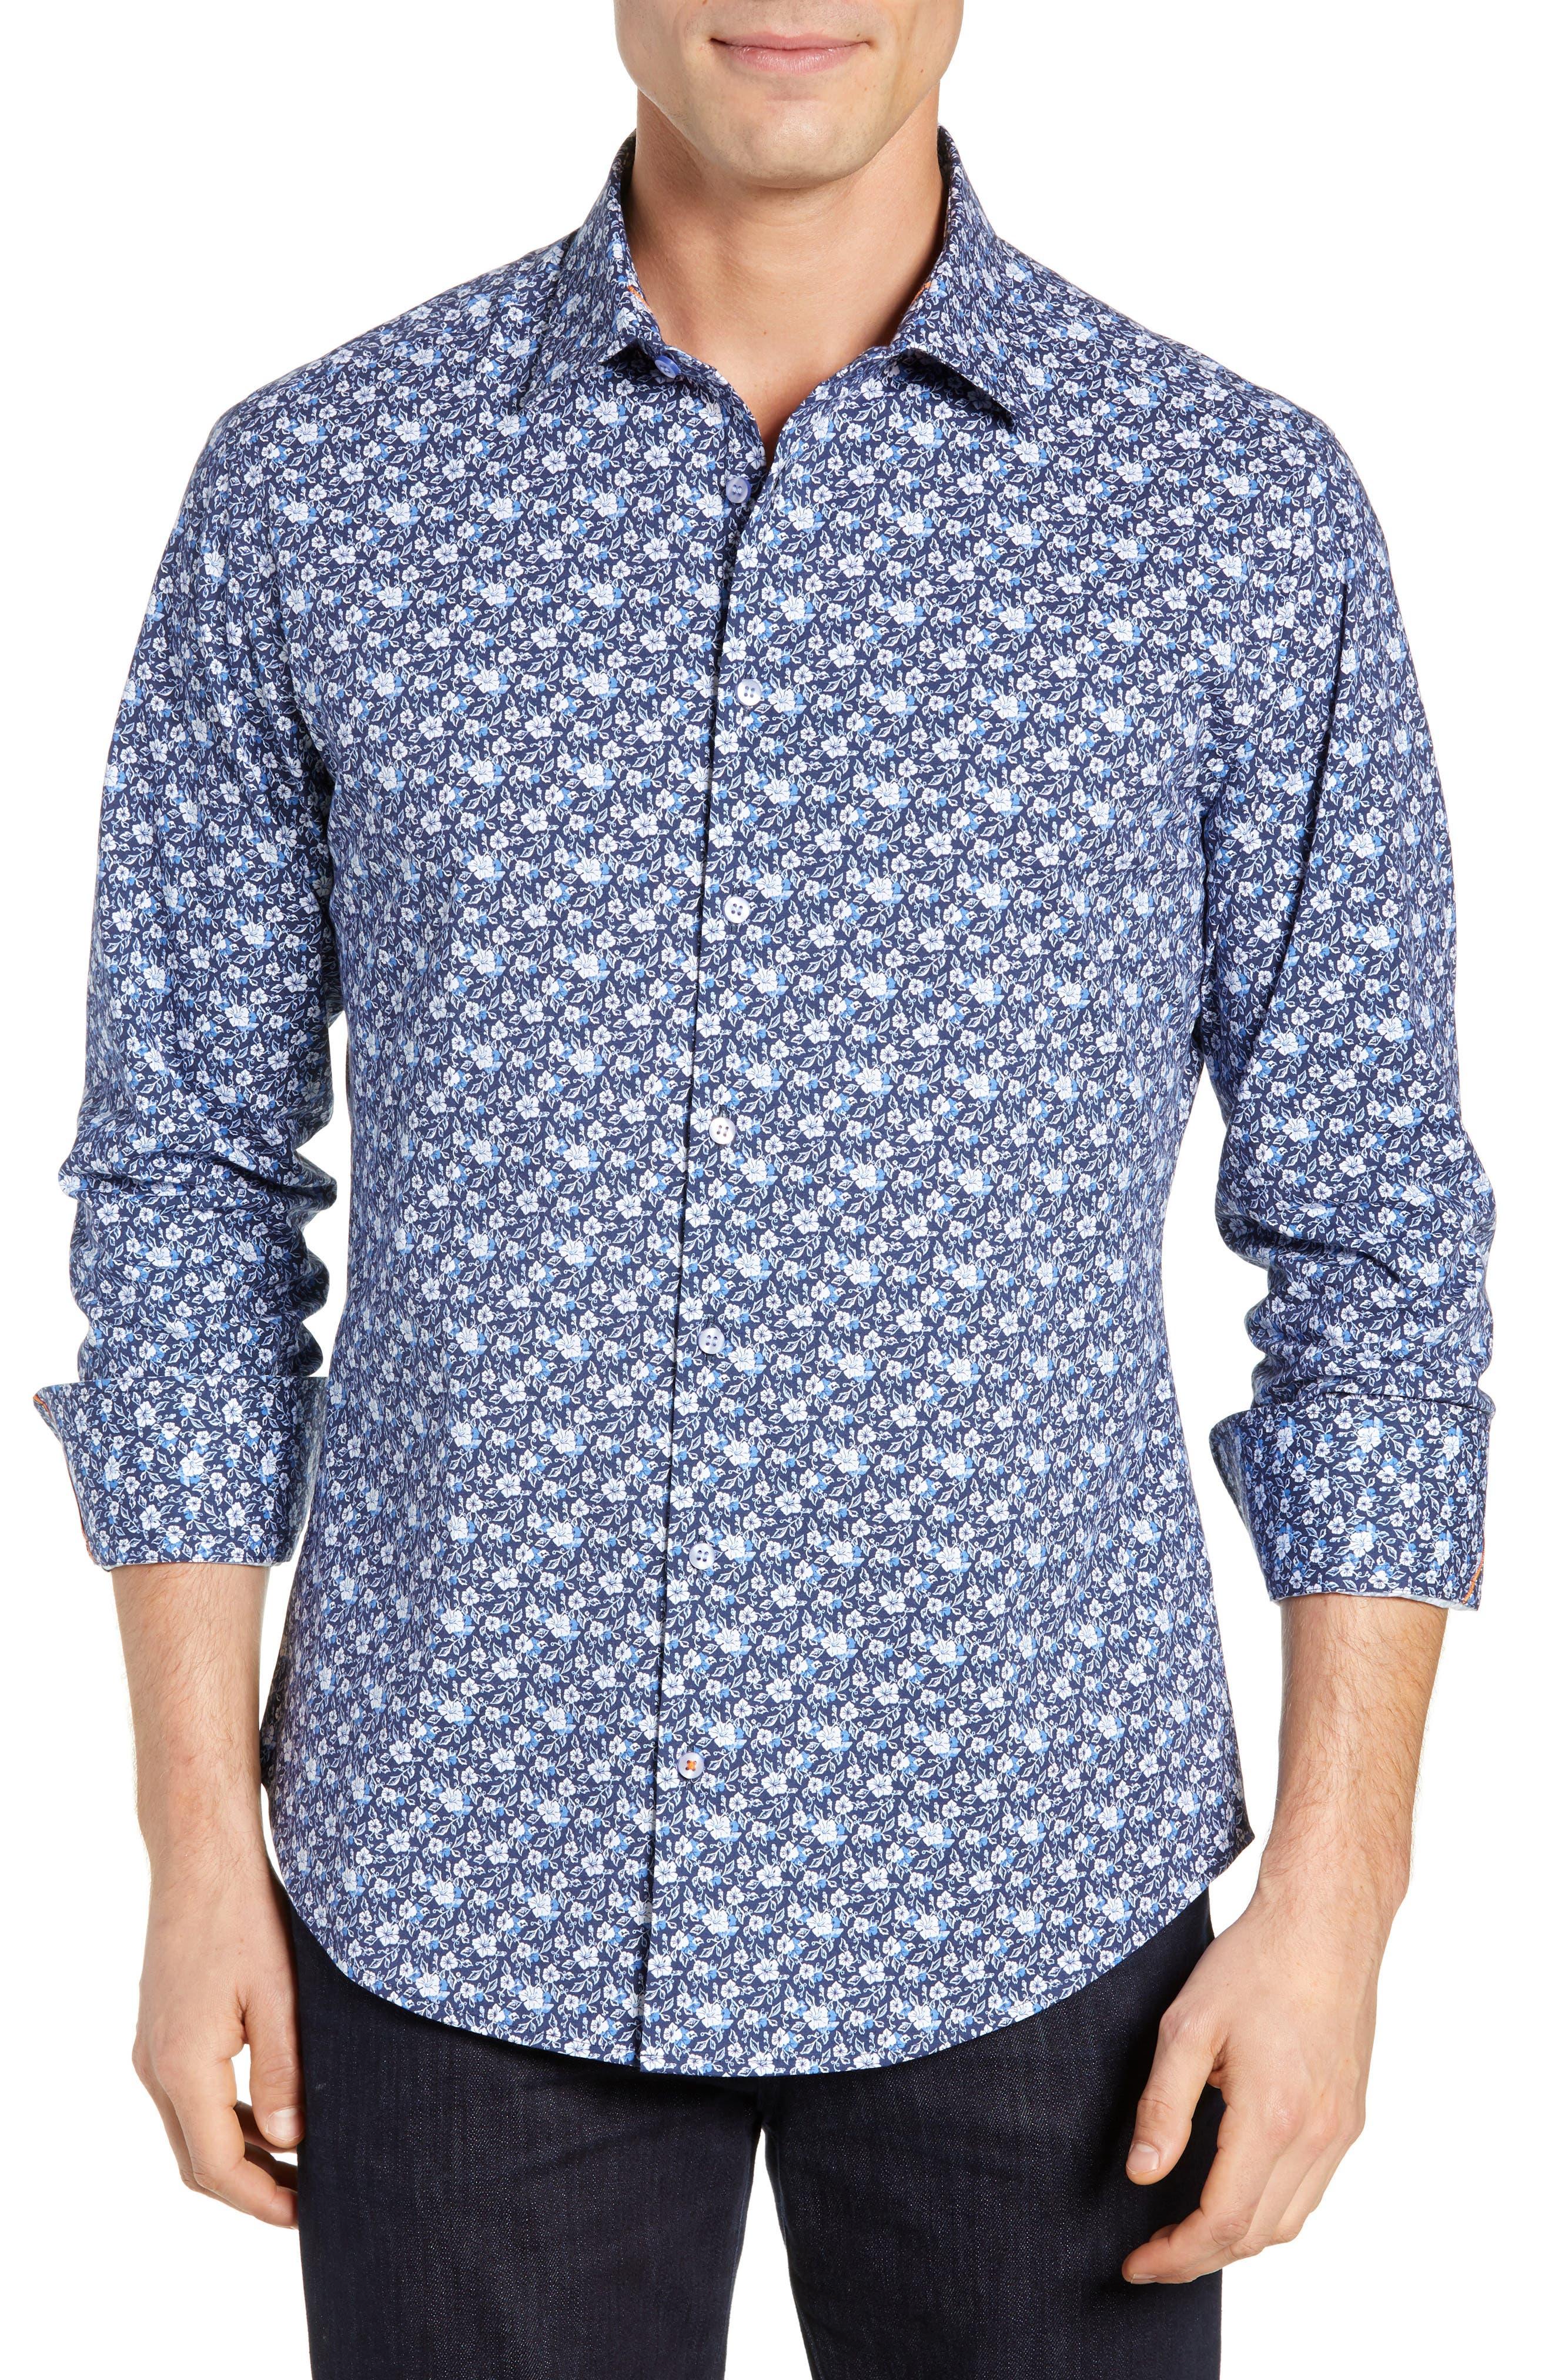 Regular Fit Floral Print Knit Sport Shirt,                             Main thumbnail 1, color,                             NAVY